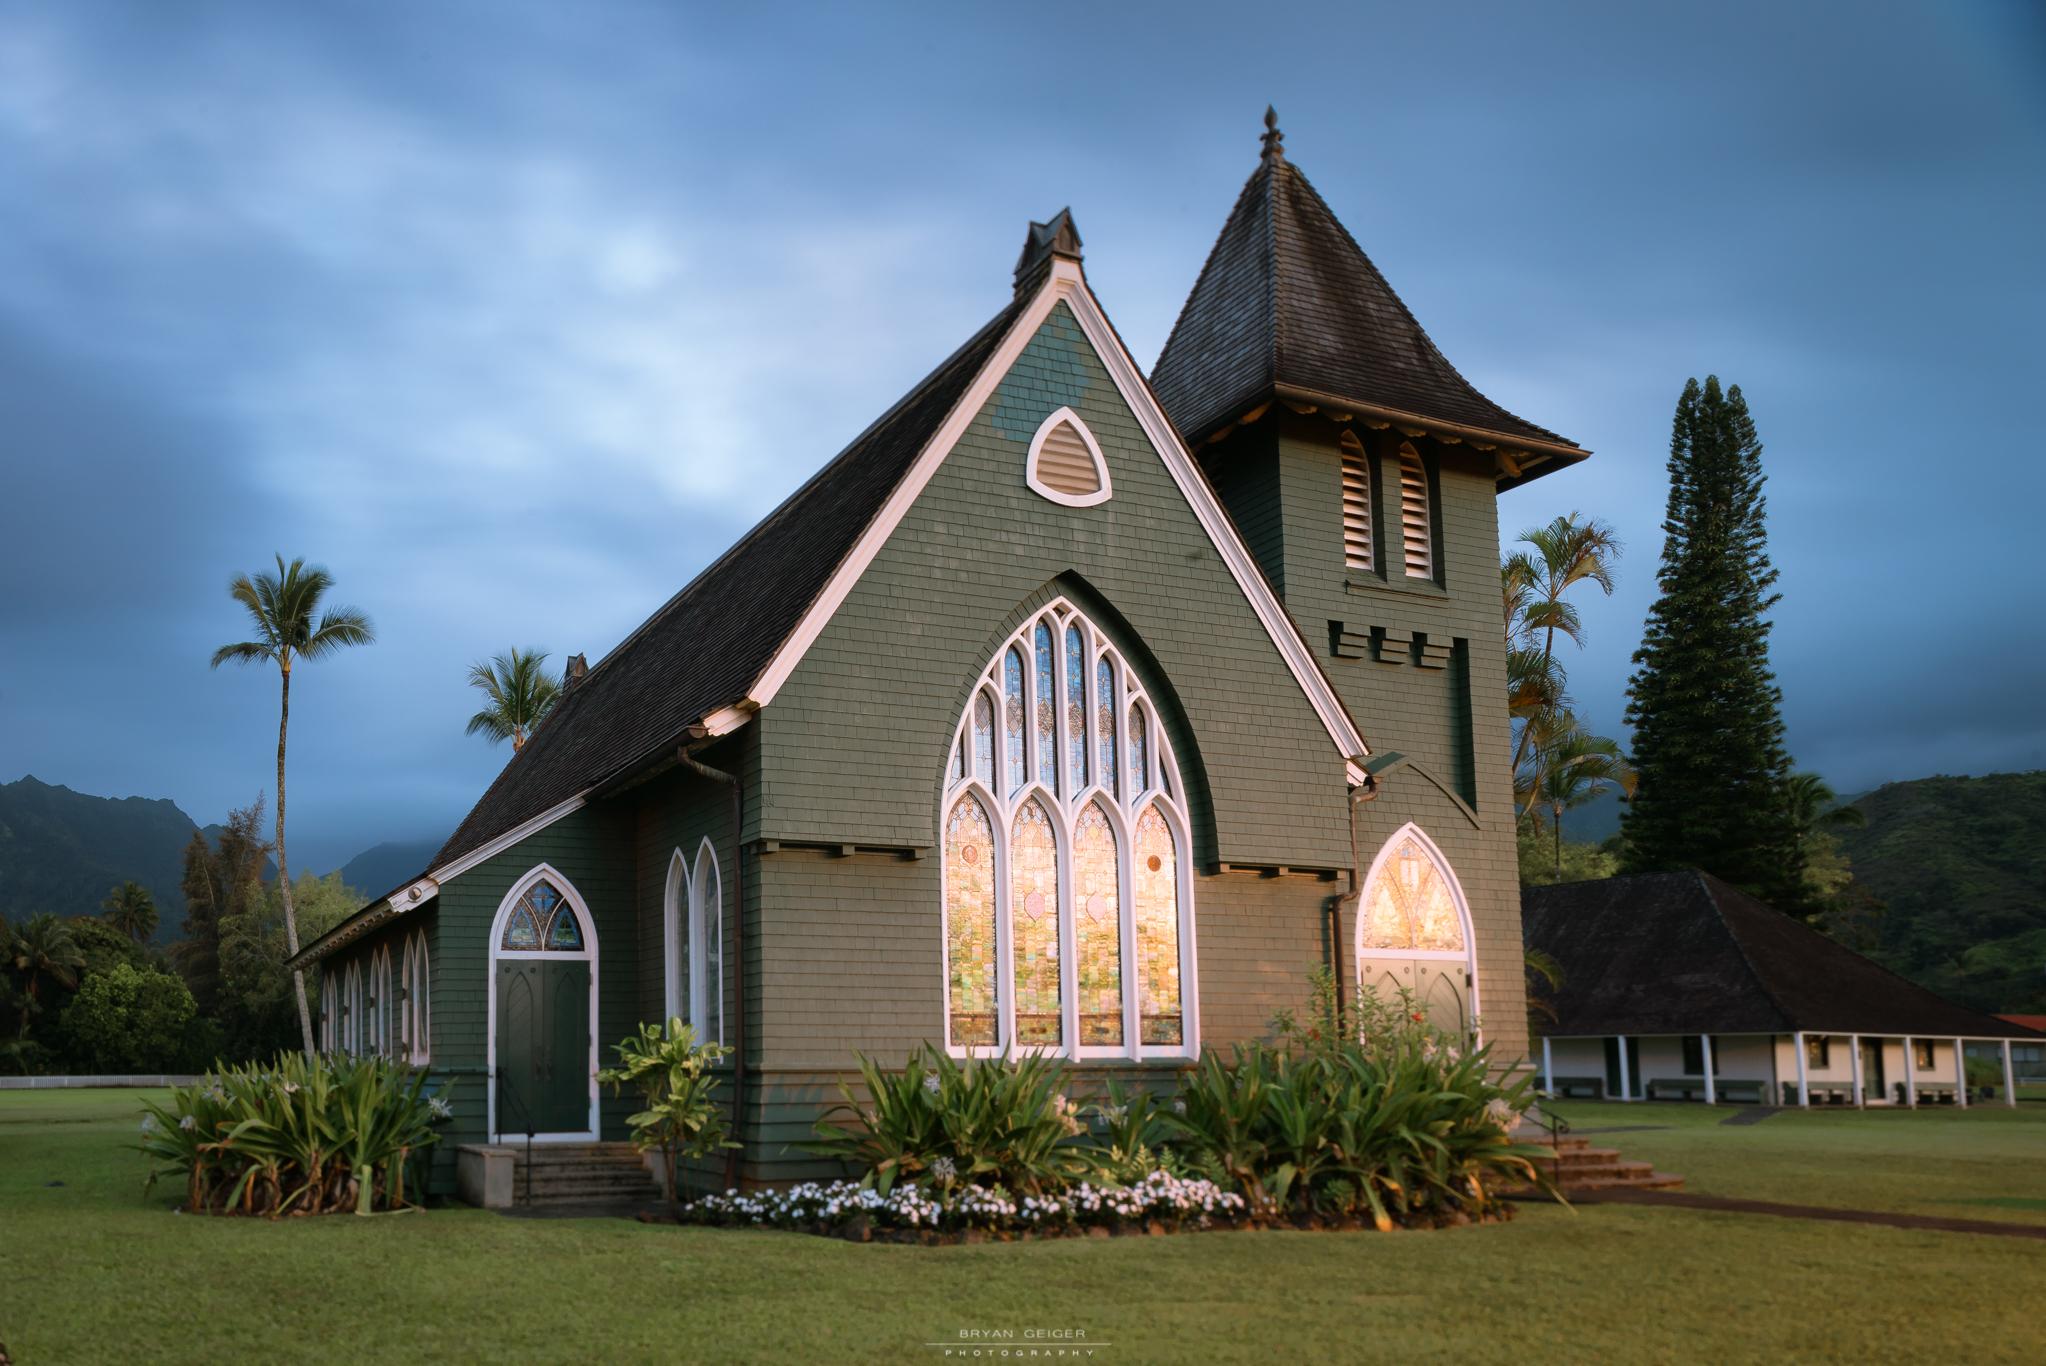 The Iconic Hanalei Church